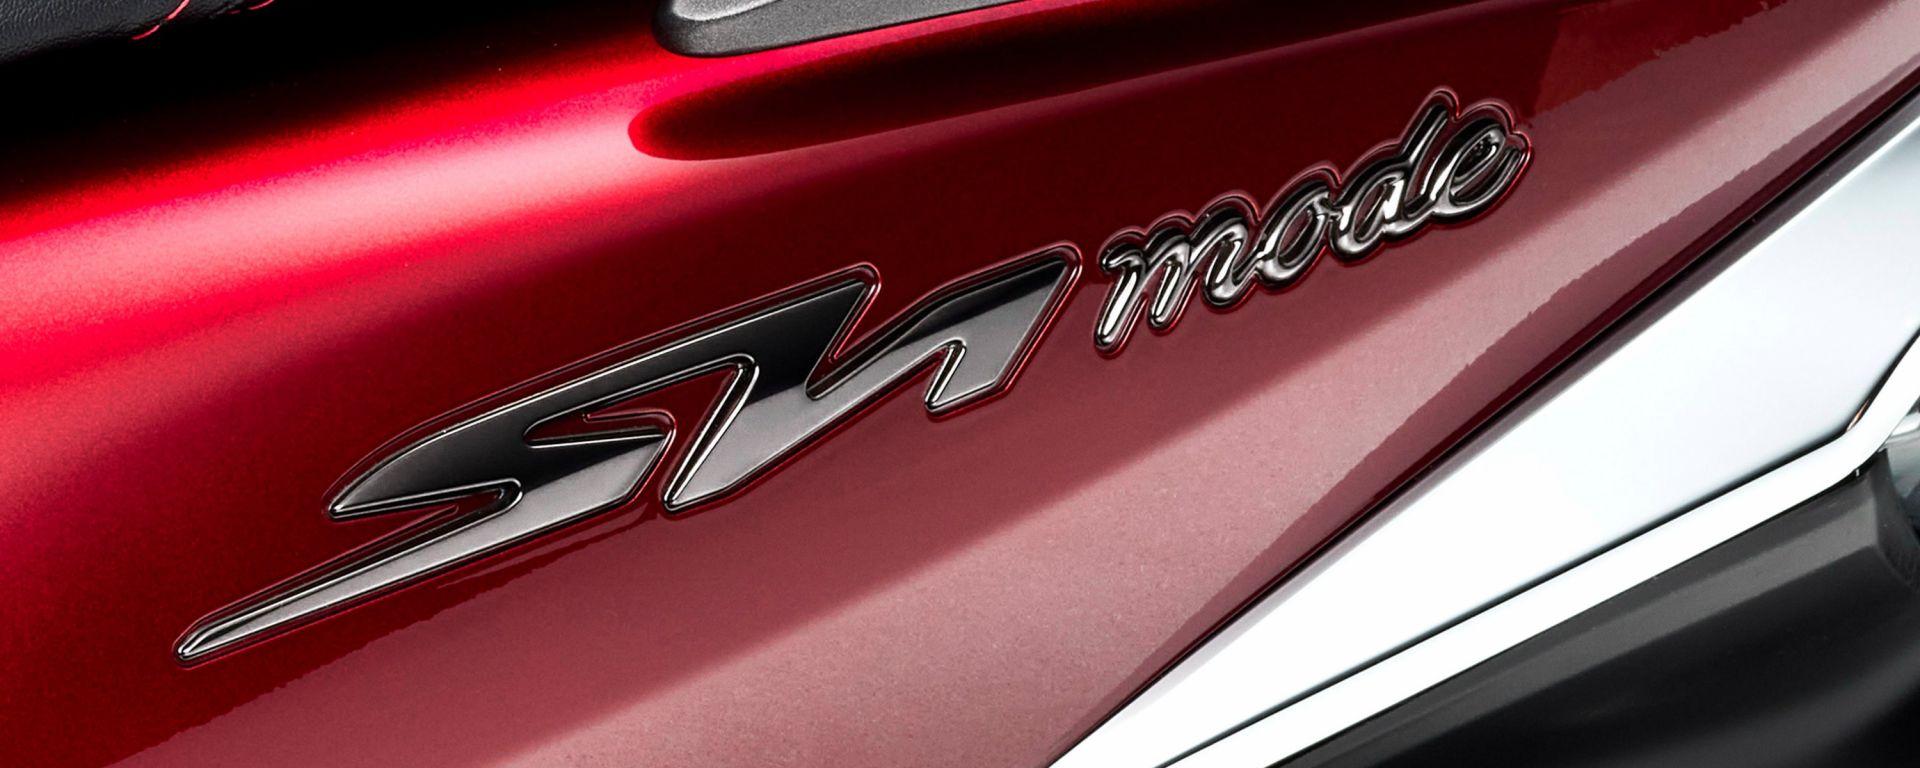 Honda SH Mode 125 2021: il logo sulla fiancata